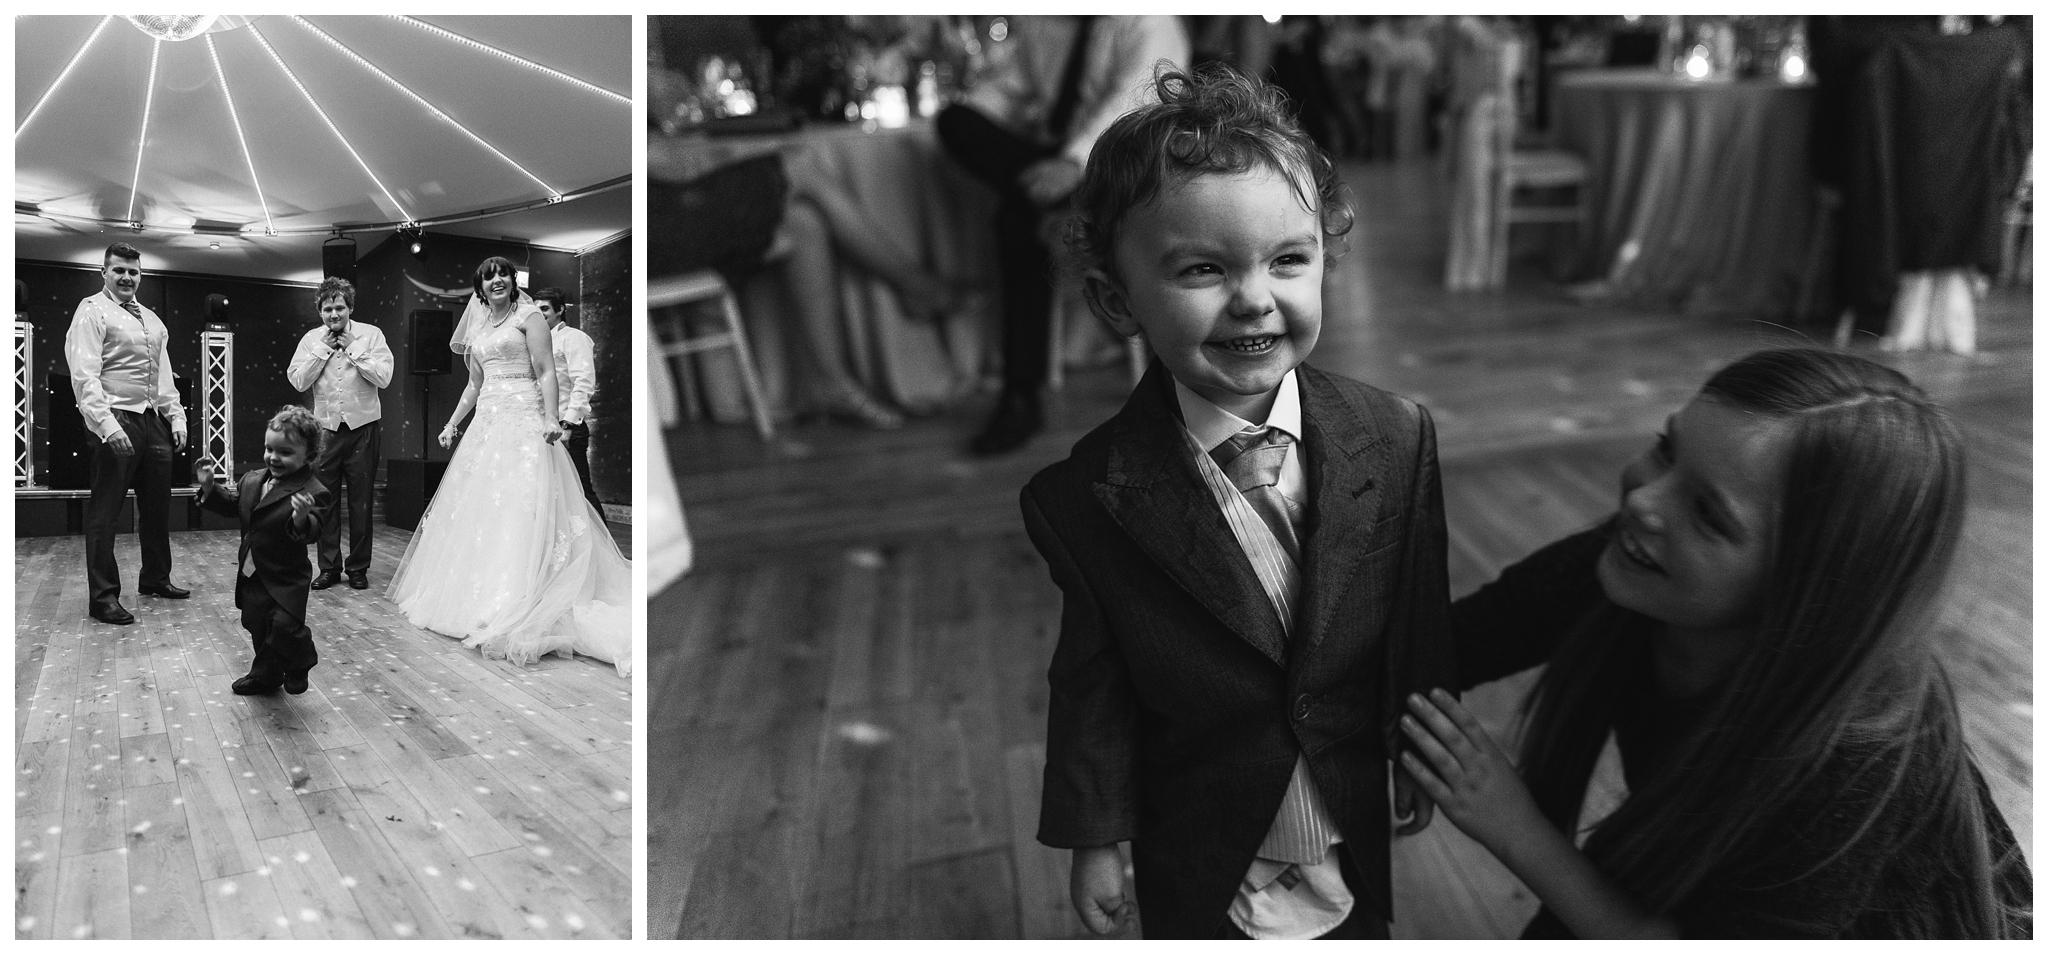 Emma&Paul-Elmore-Court-Winter-Wedding-Nikki-Cooper-Photography_0105.jpg